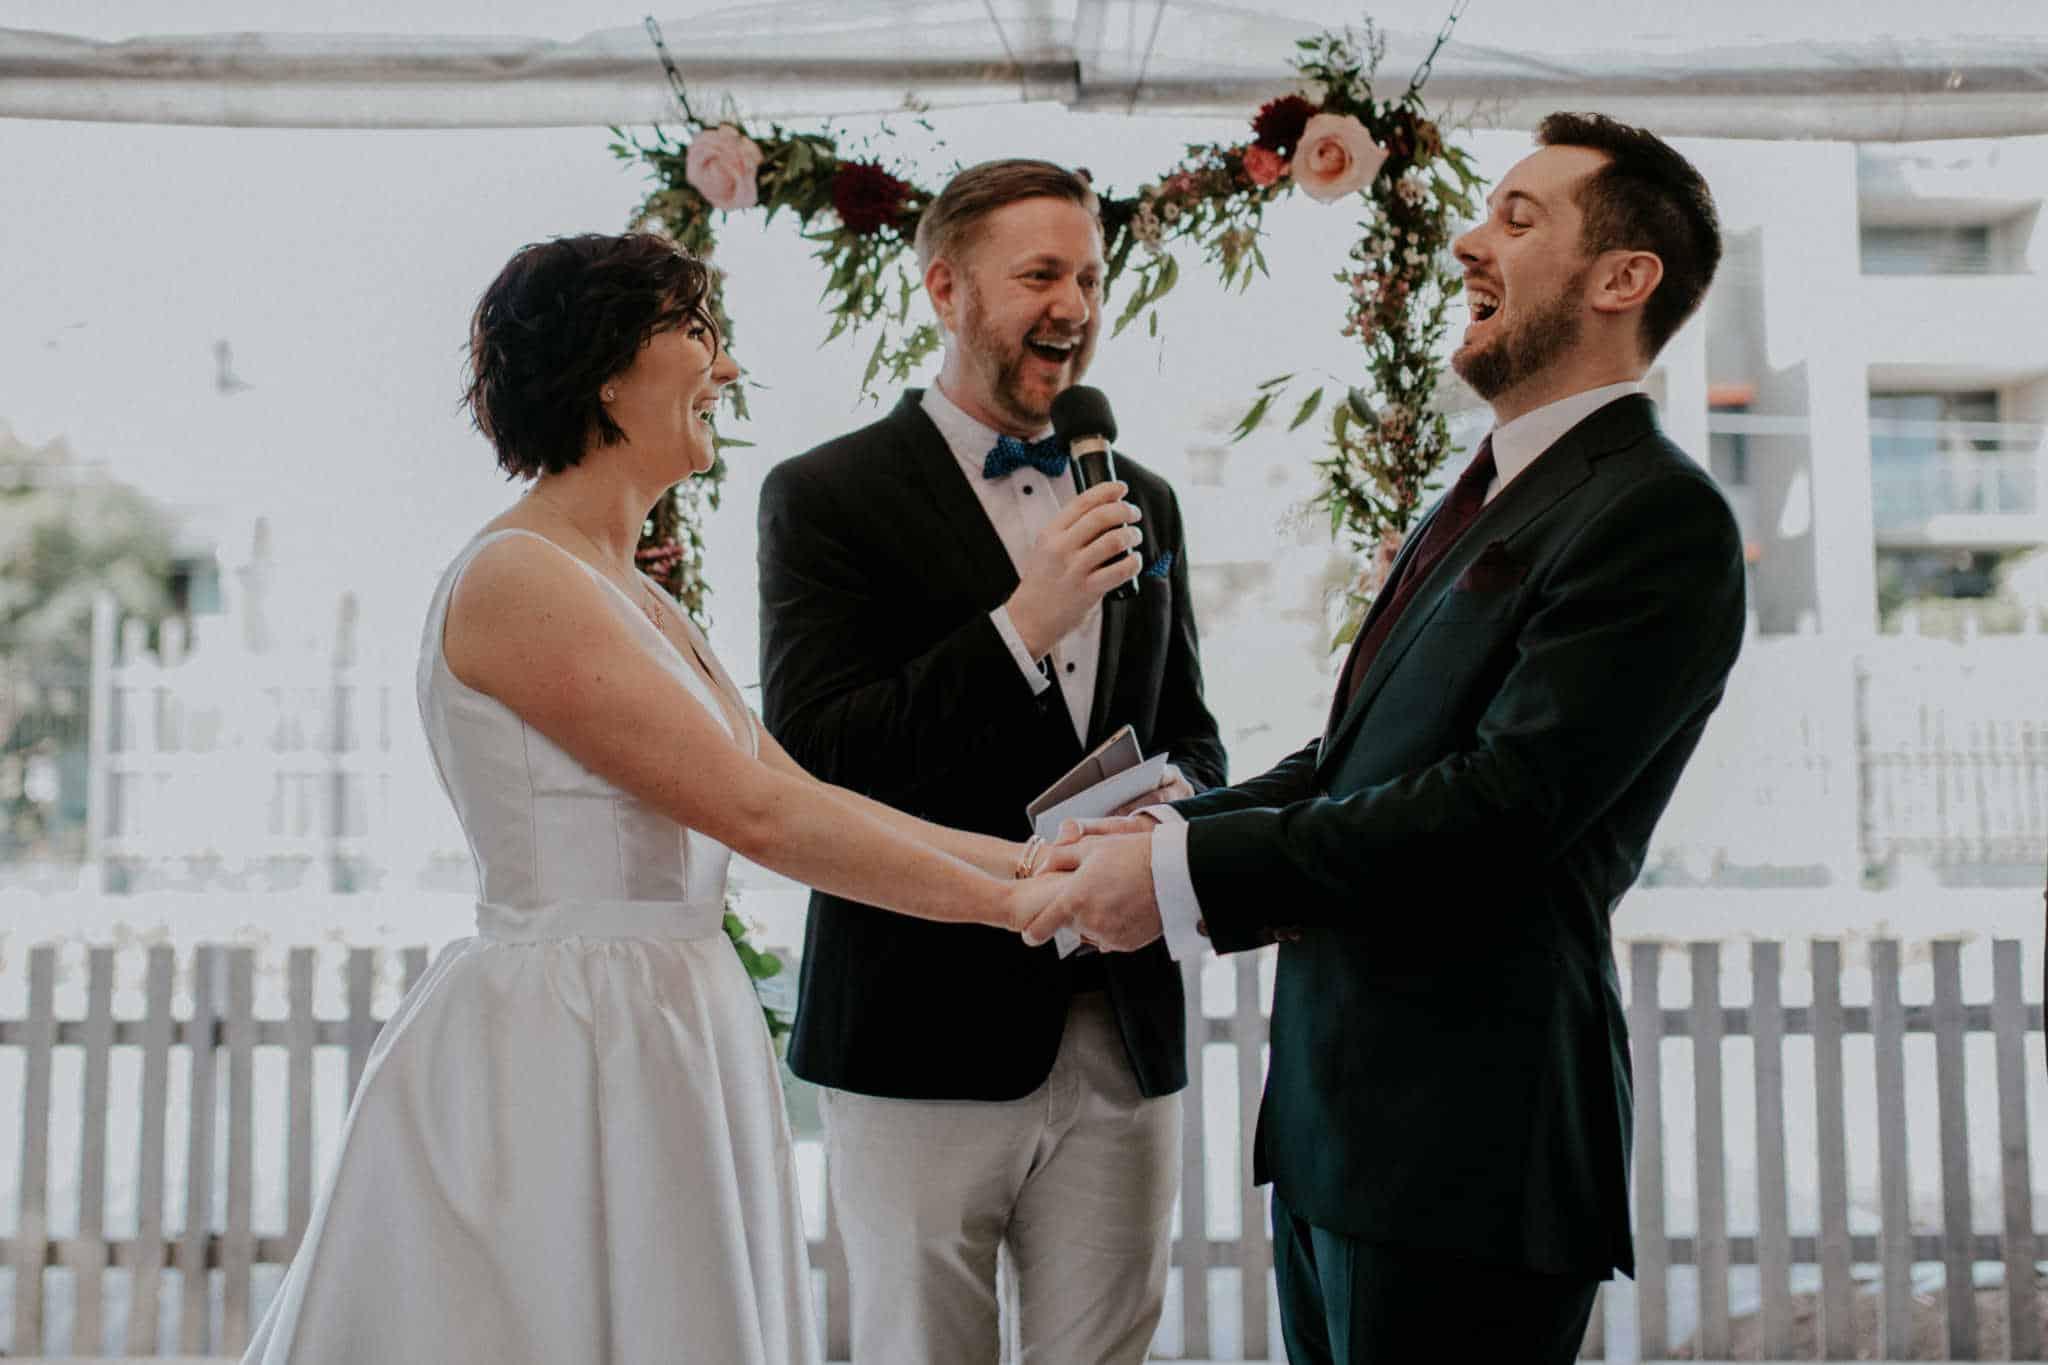 Camperdown Commons Wedding - Stephen Lee Marriage Celebrant Sydney